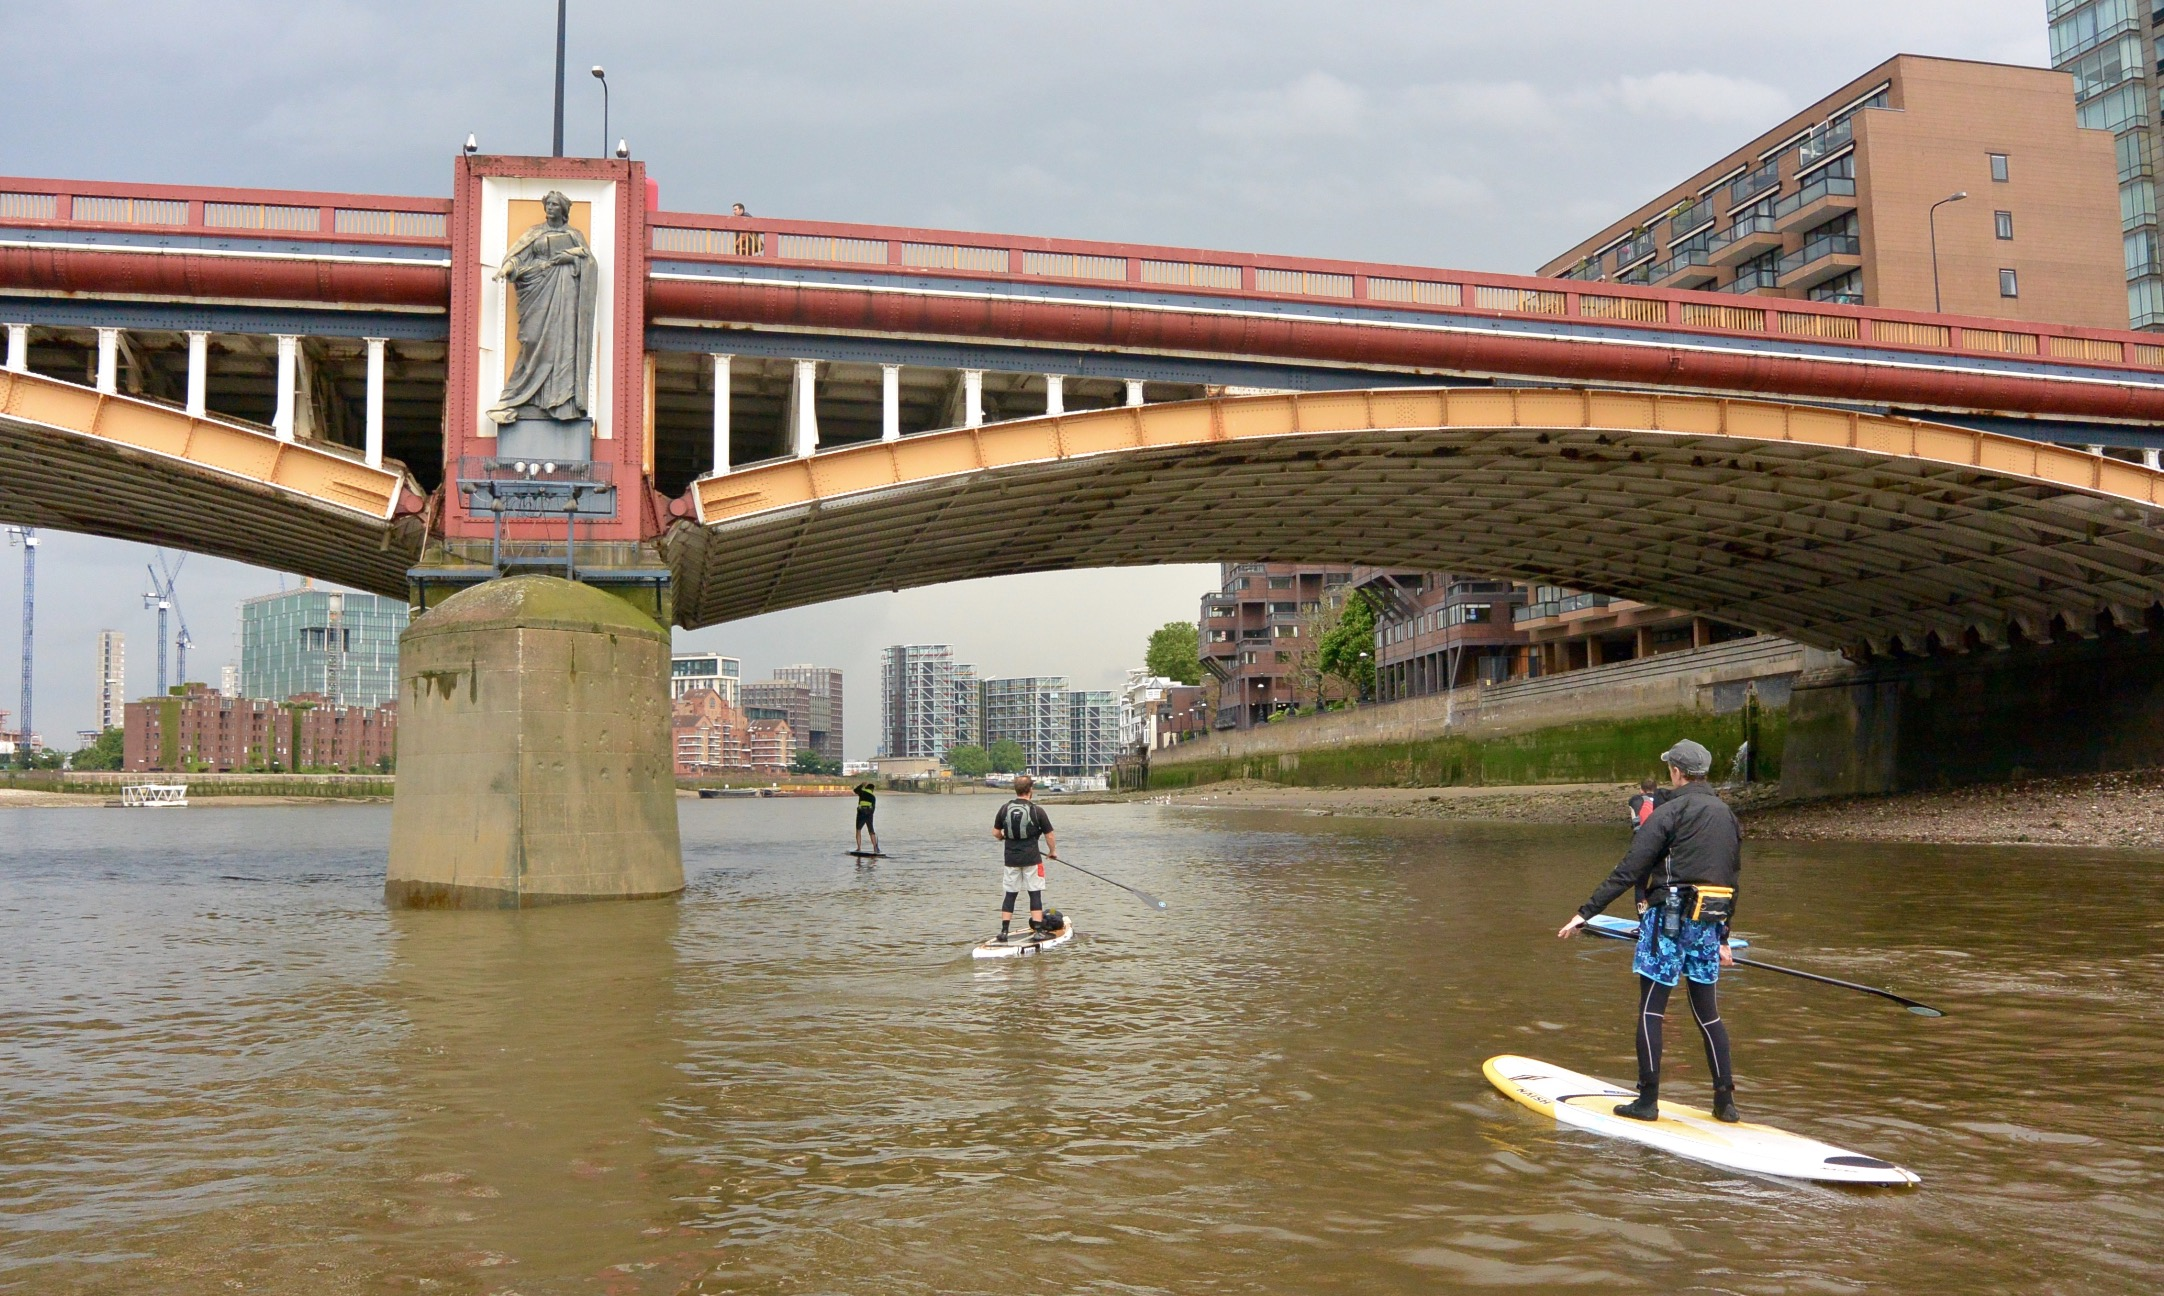 Big Ben London SUP race